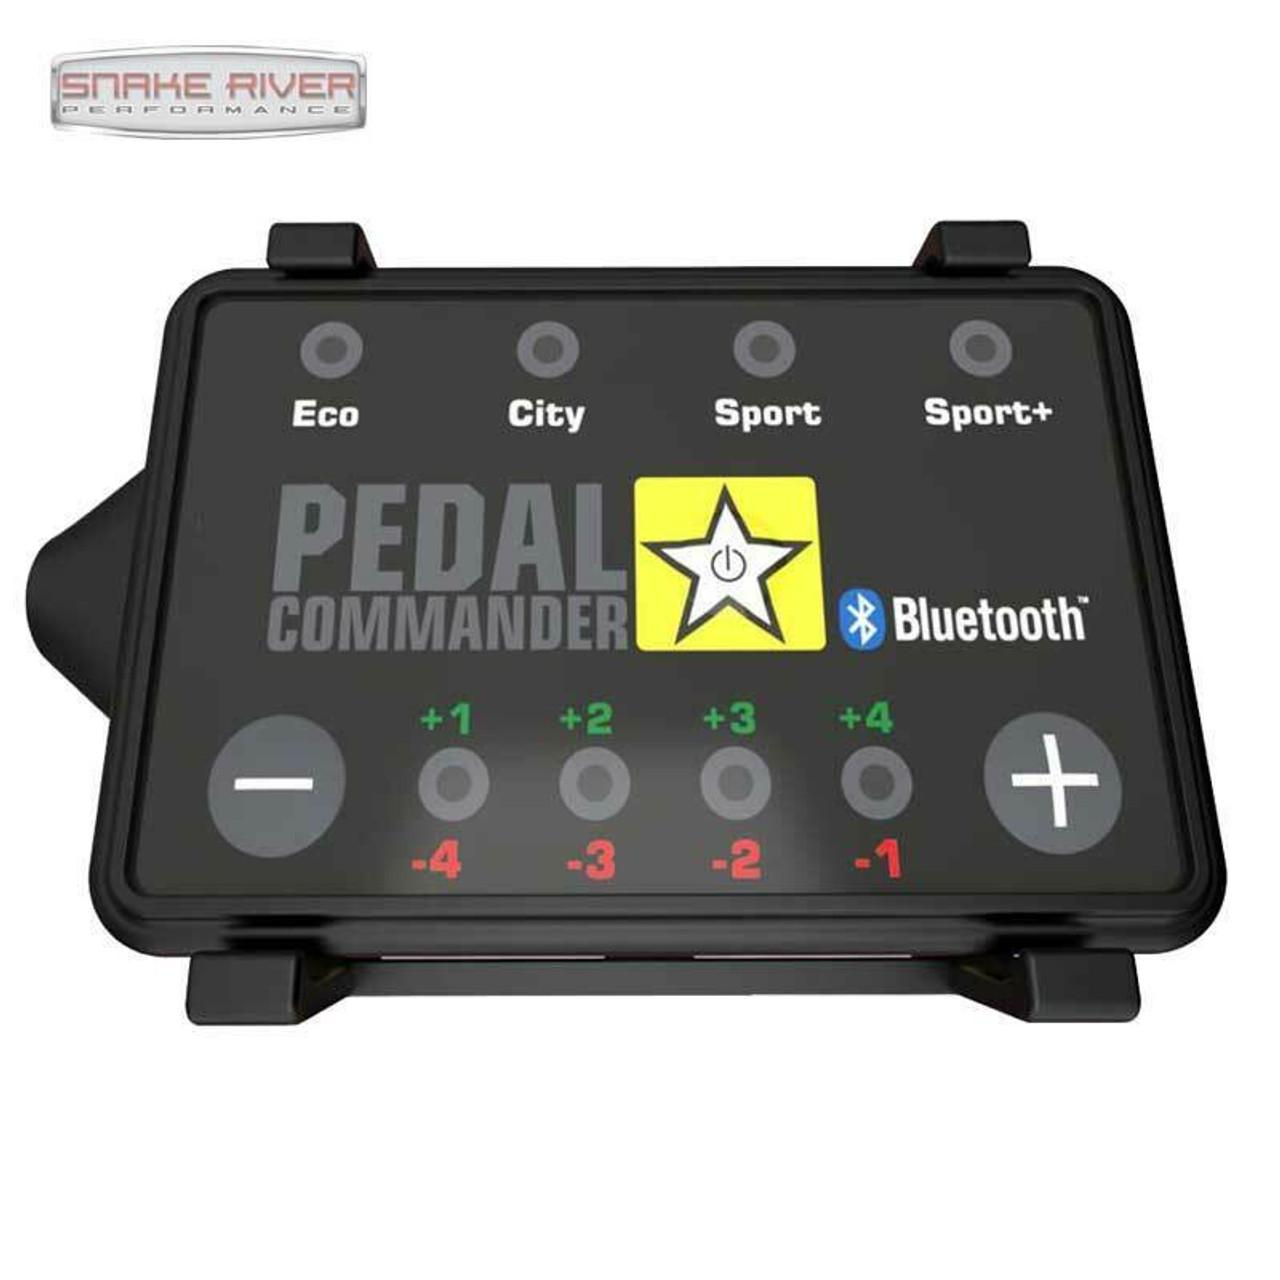 PEDAL COMMANDER THROTTLE CONTROL FOR 19-20 CHEVY SILVERADO GMC SIERRA 1500 PC77